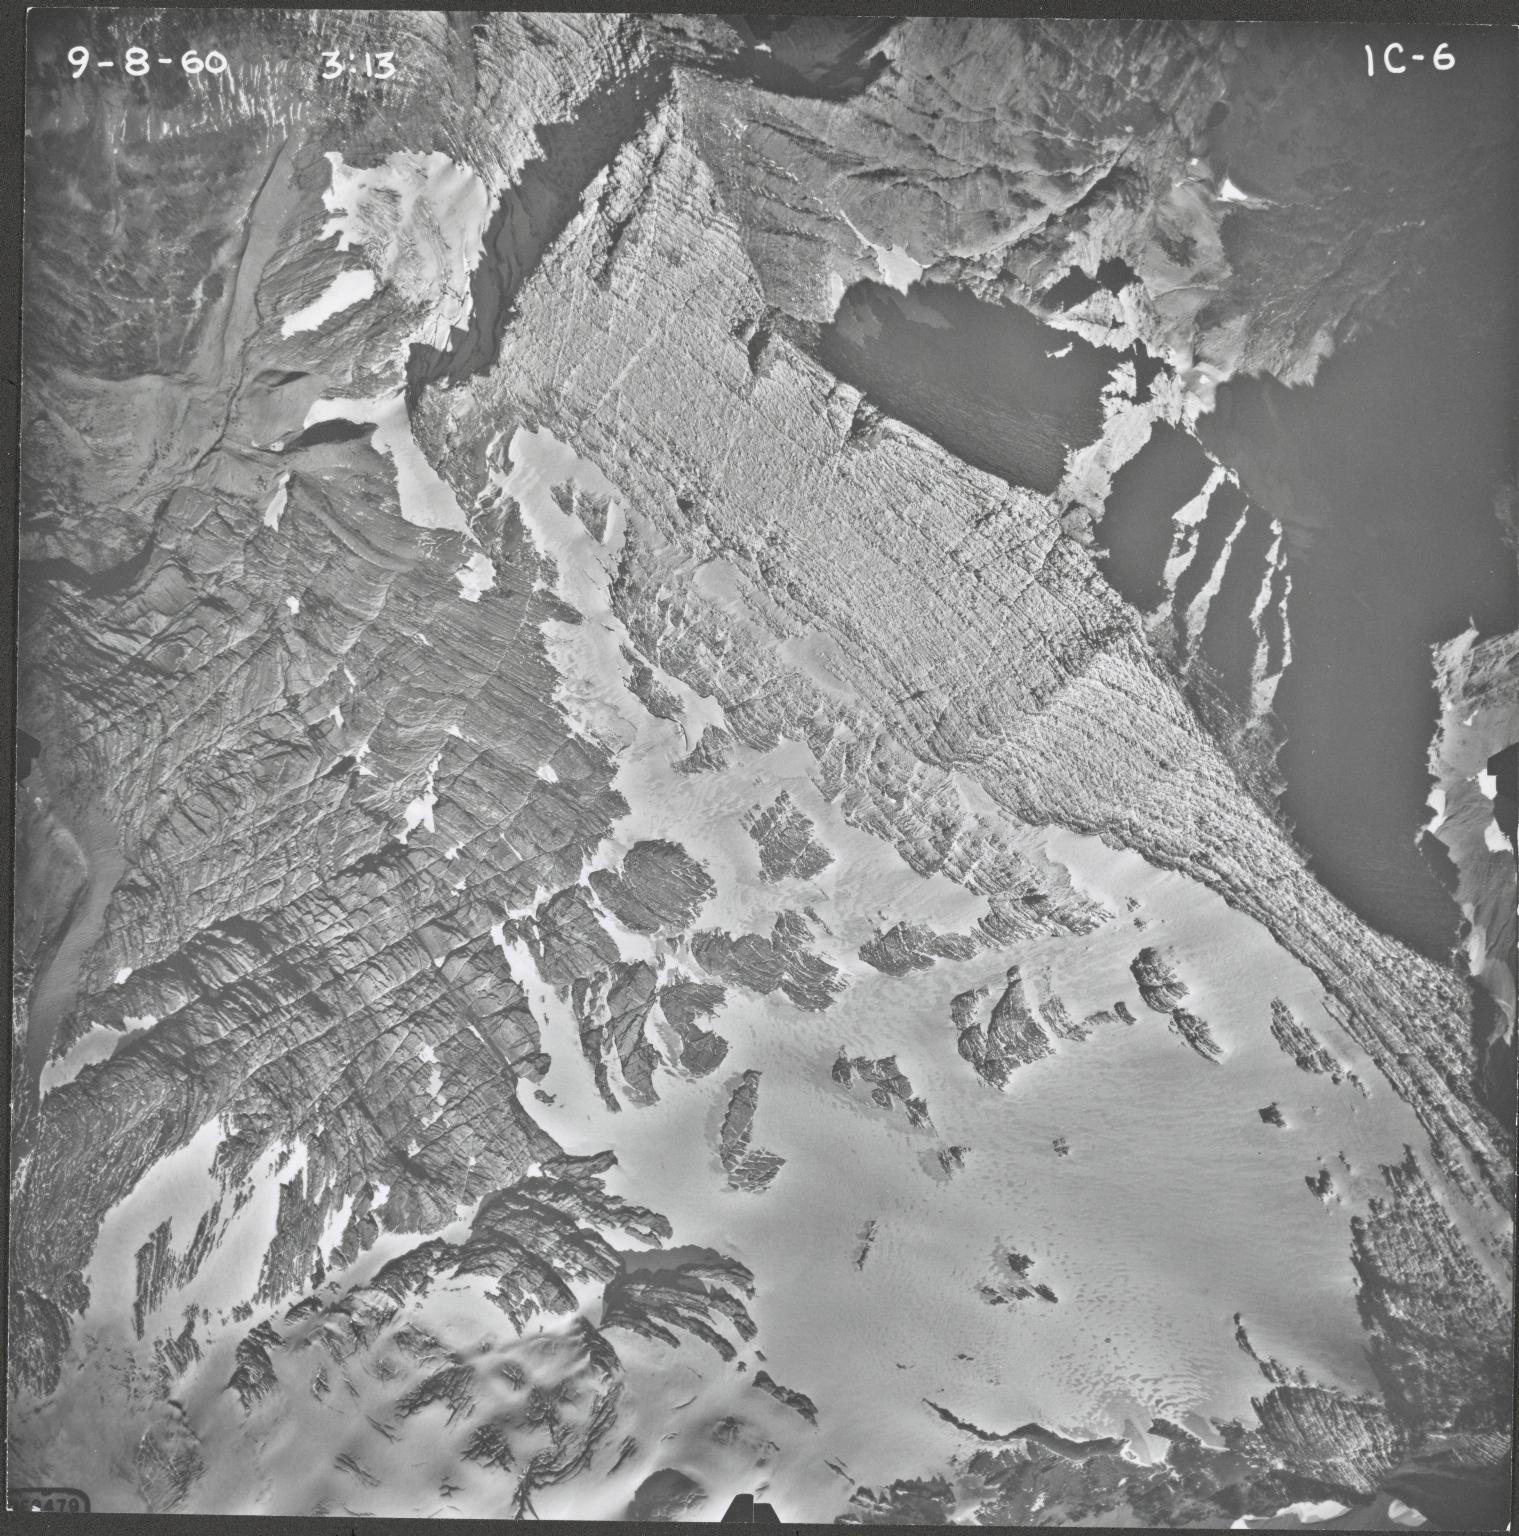 Agassiz Glacier, aerial photograph IC-6, Montana